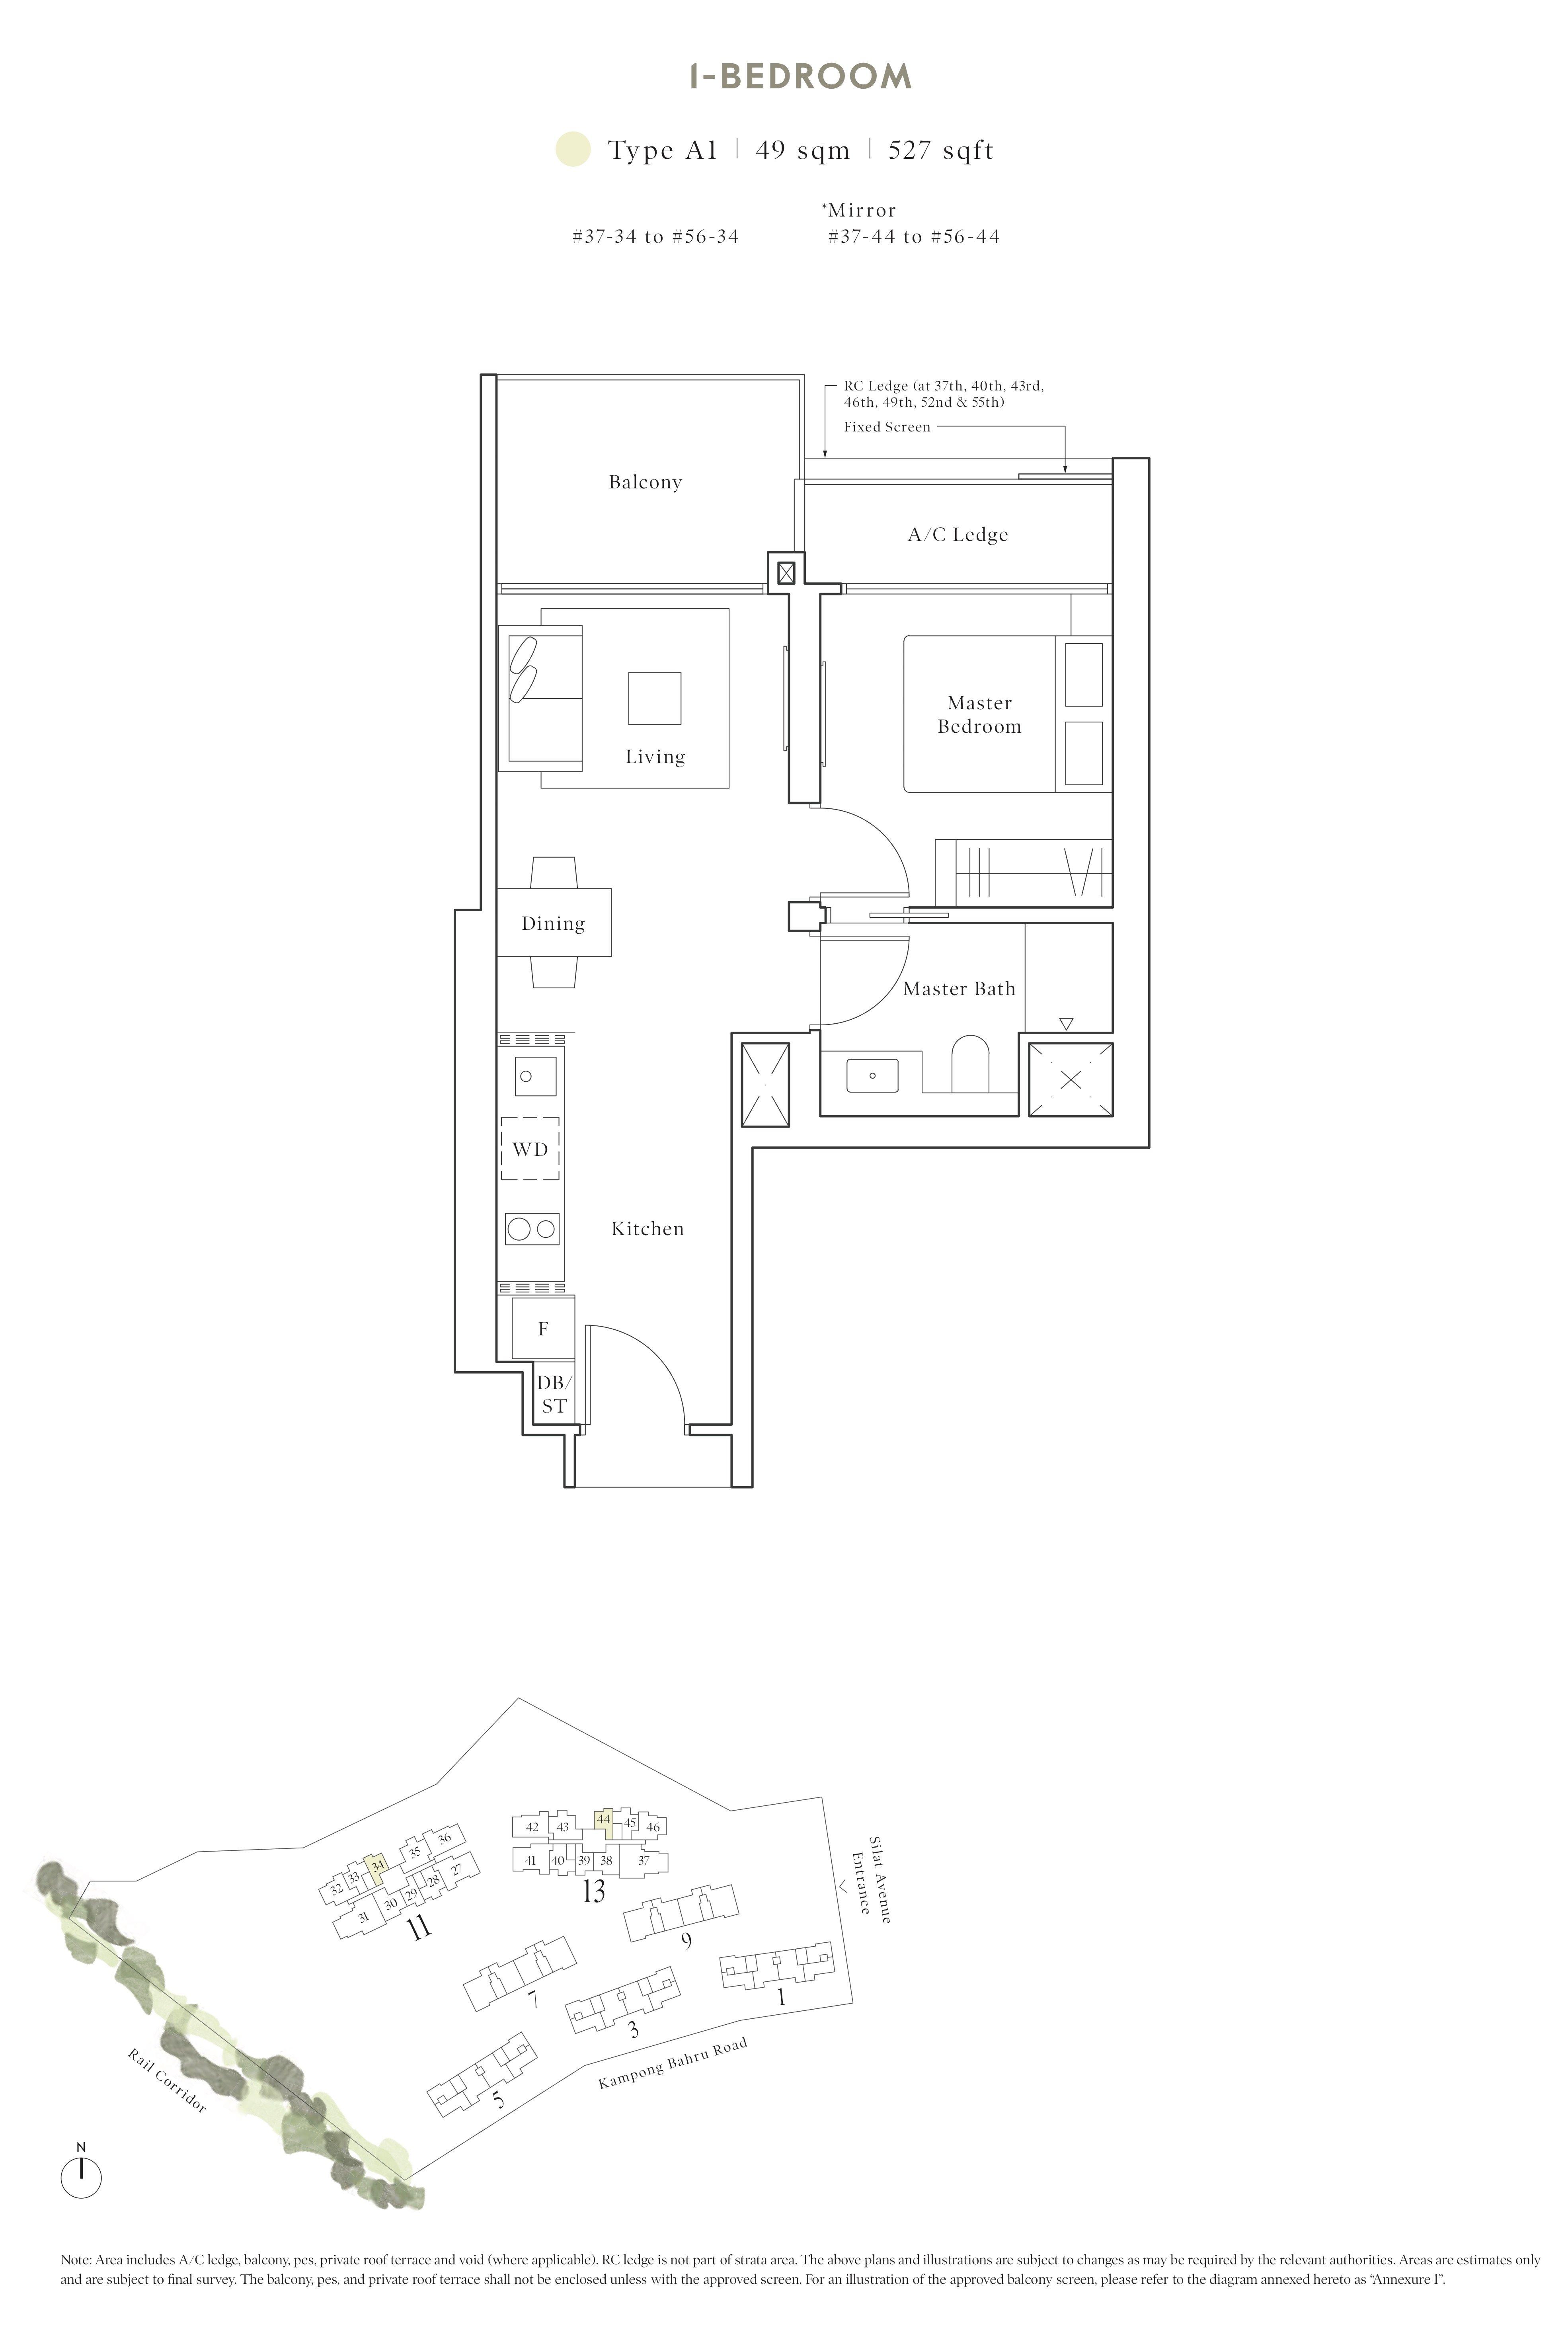 Avenue South Residence 南峰雅苑 peak floor plan 1-bedroom a1